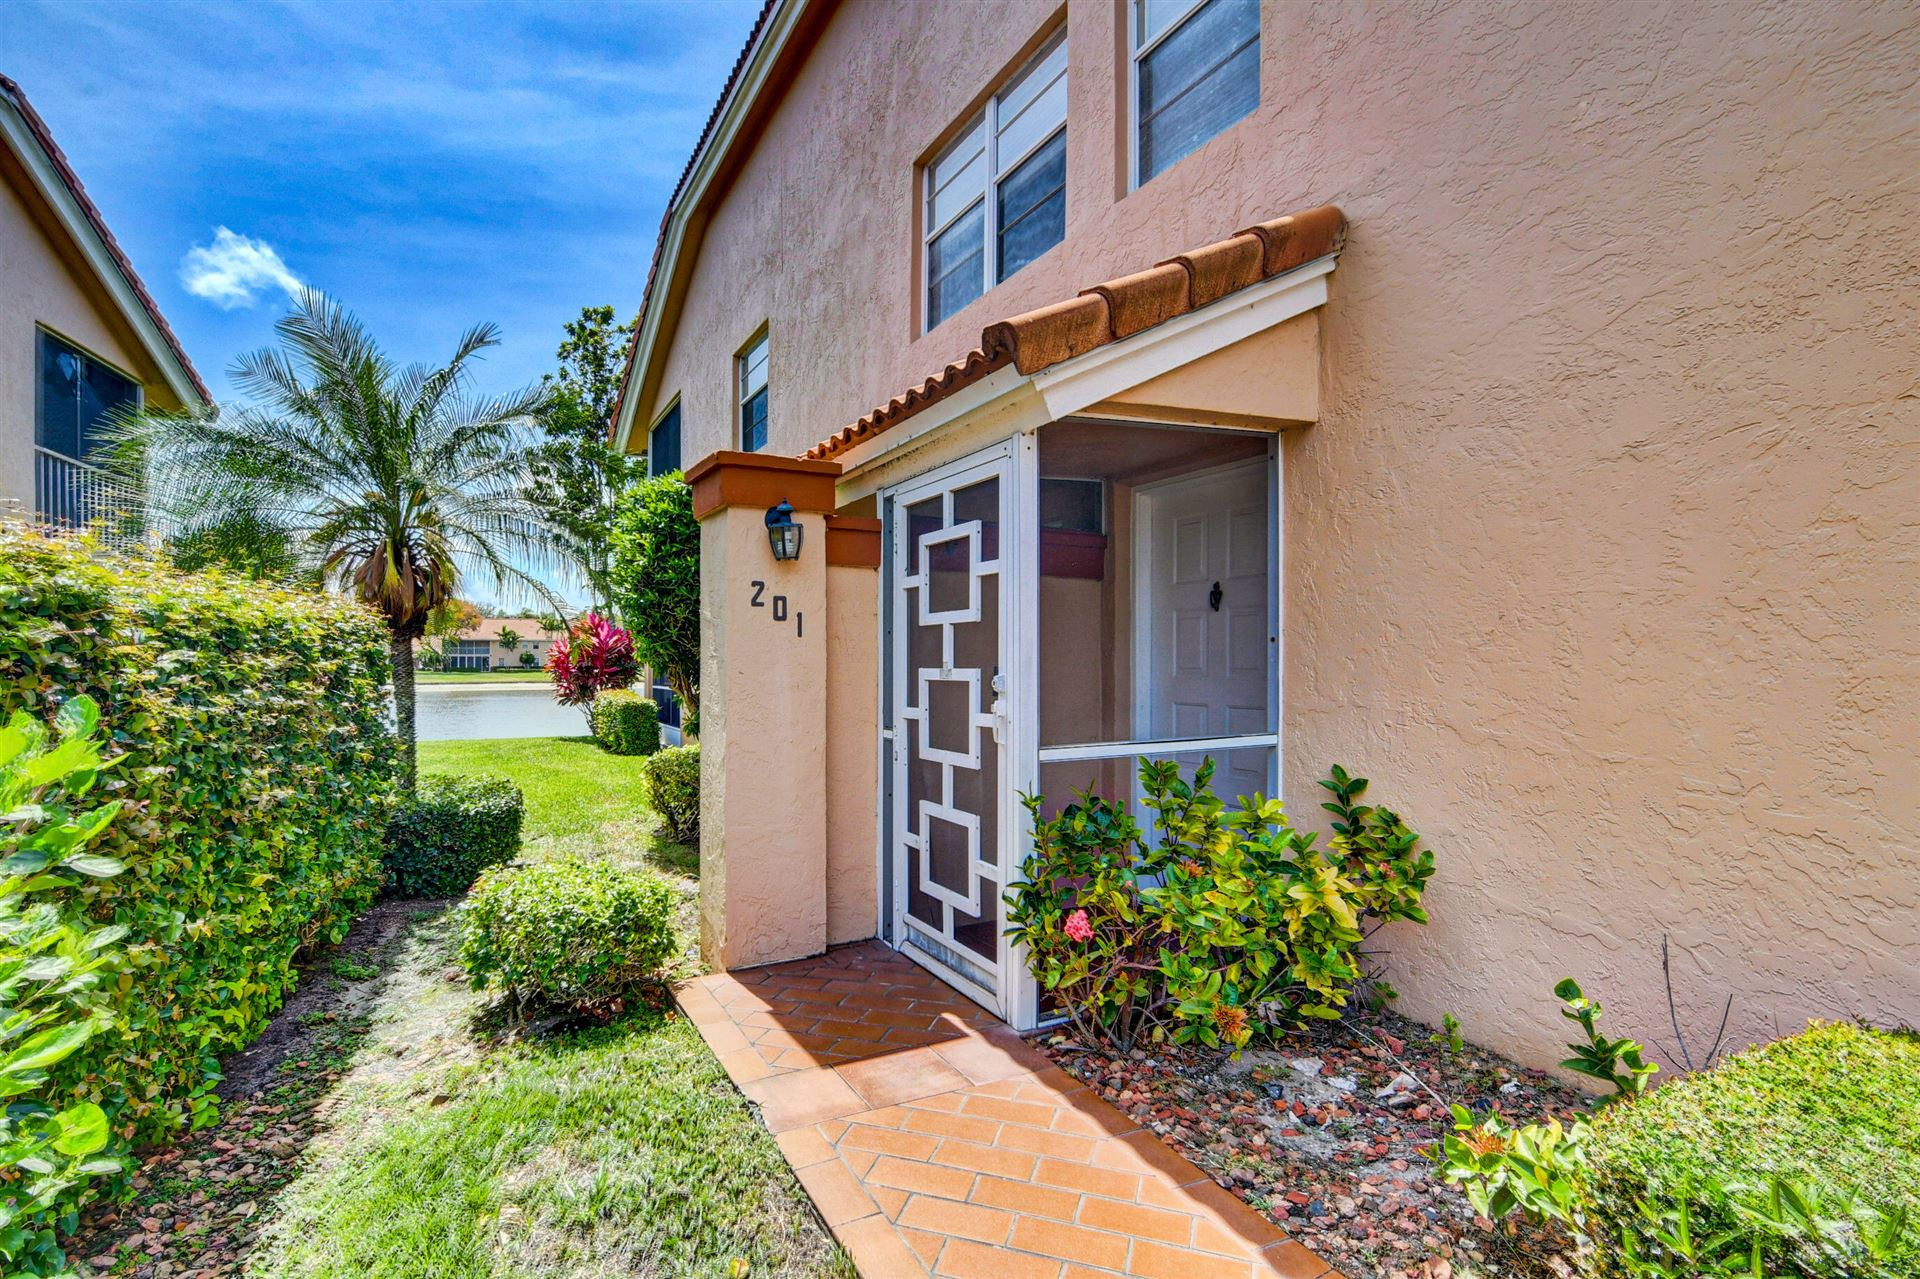 9805 Seacrest Circle #201, Boynton Beach, FL 33437 - MLS#: RX-10712393